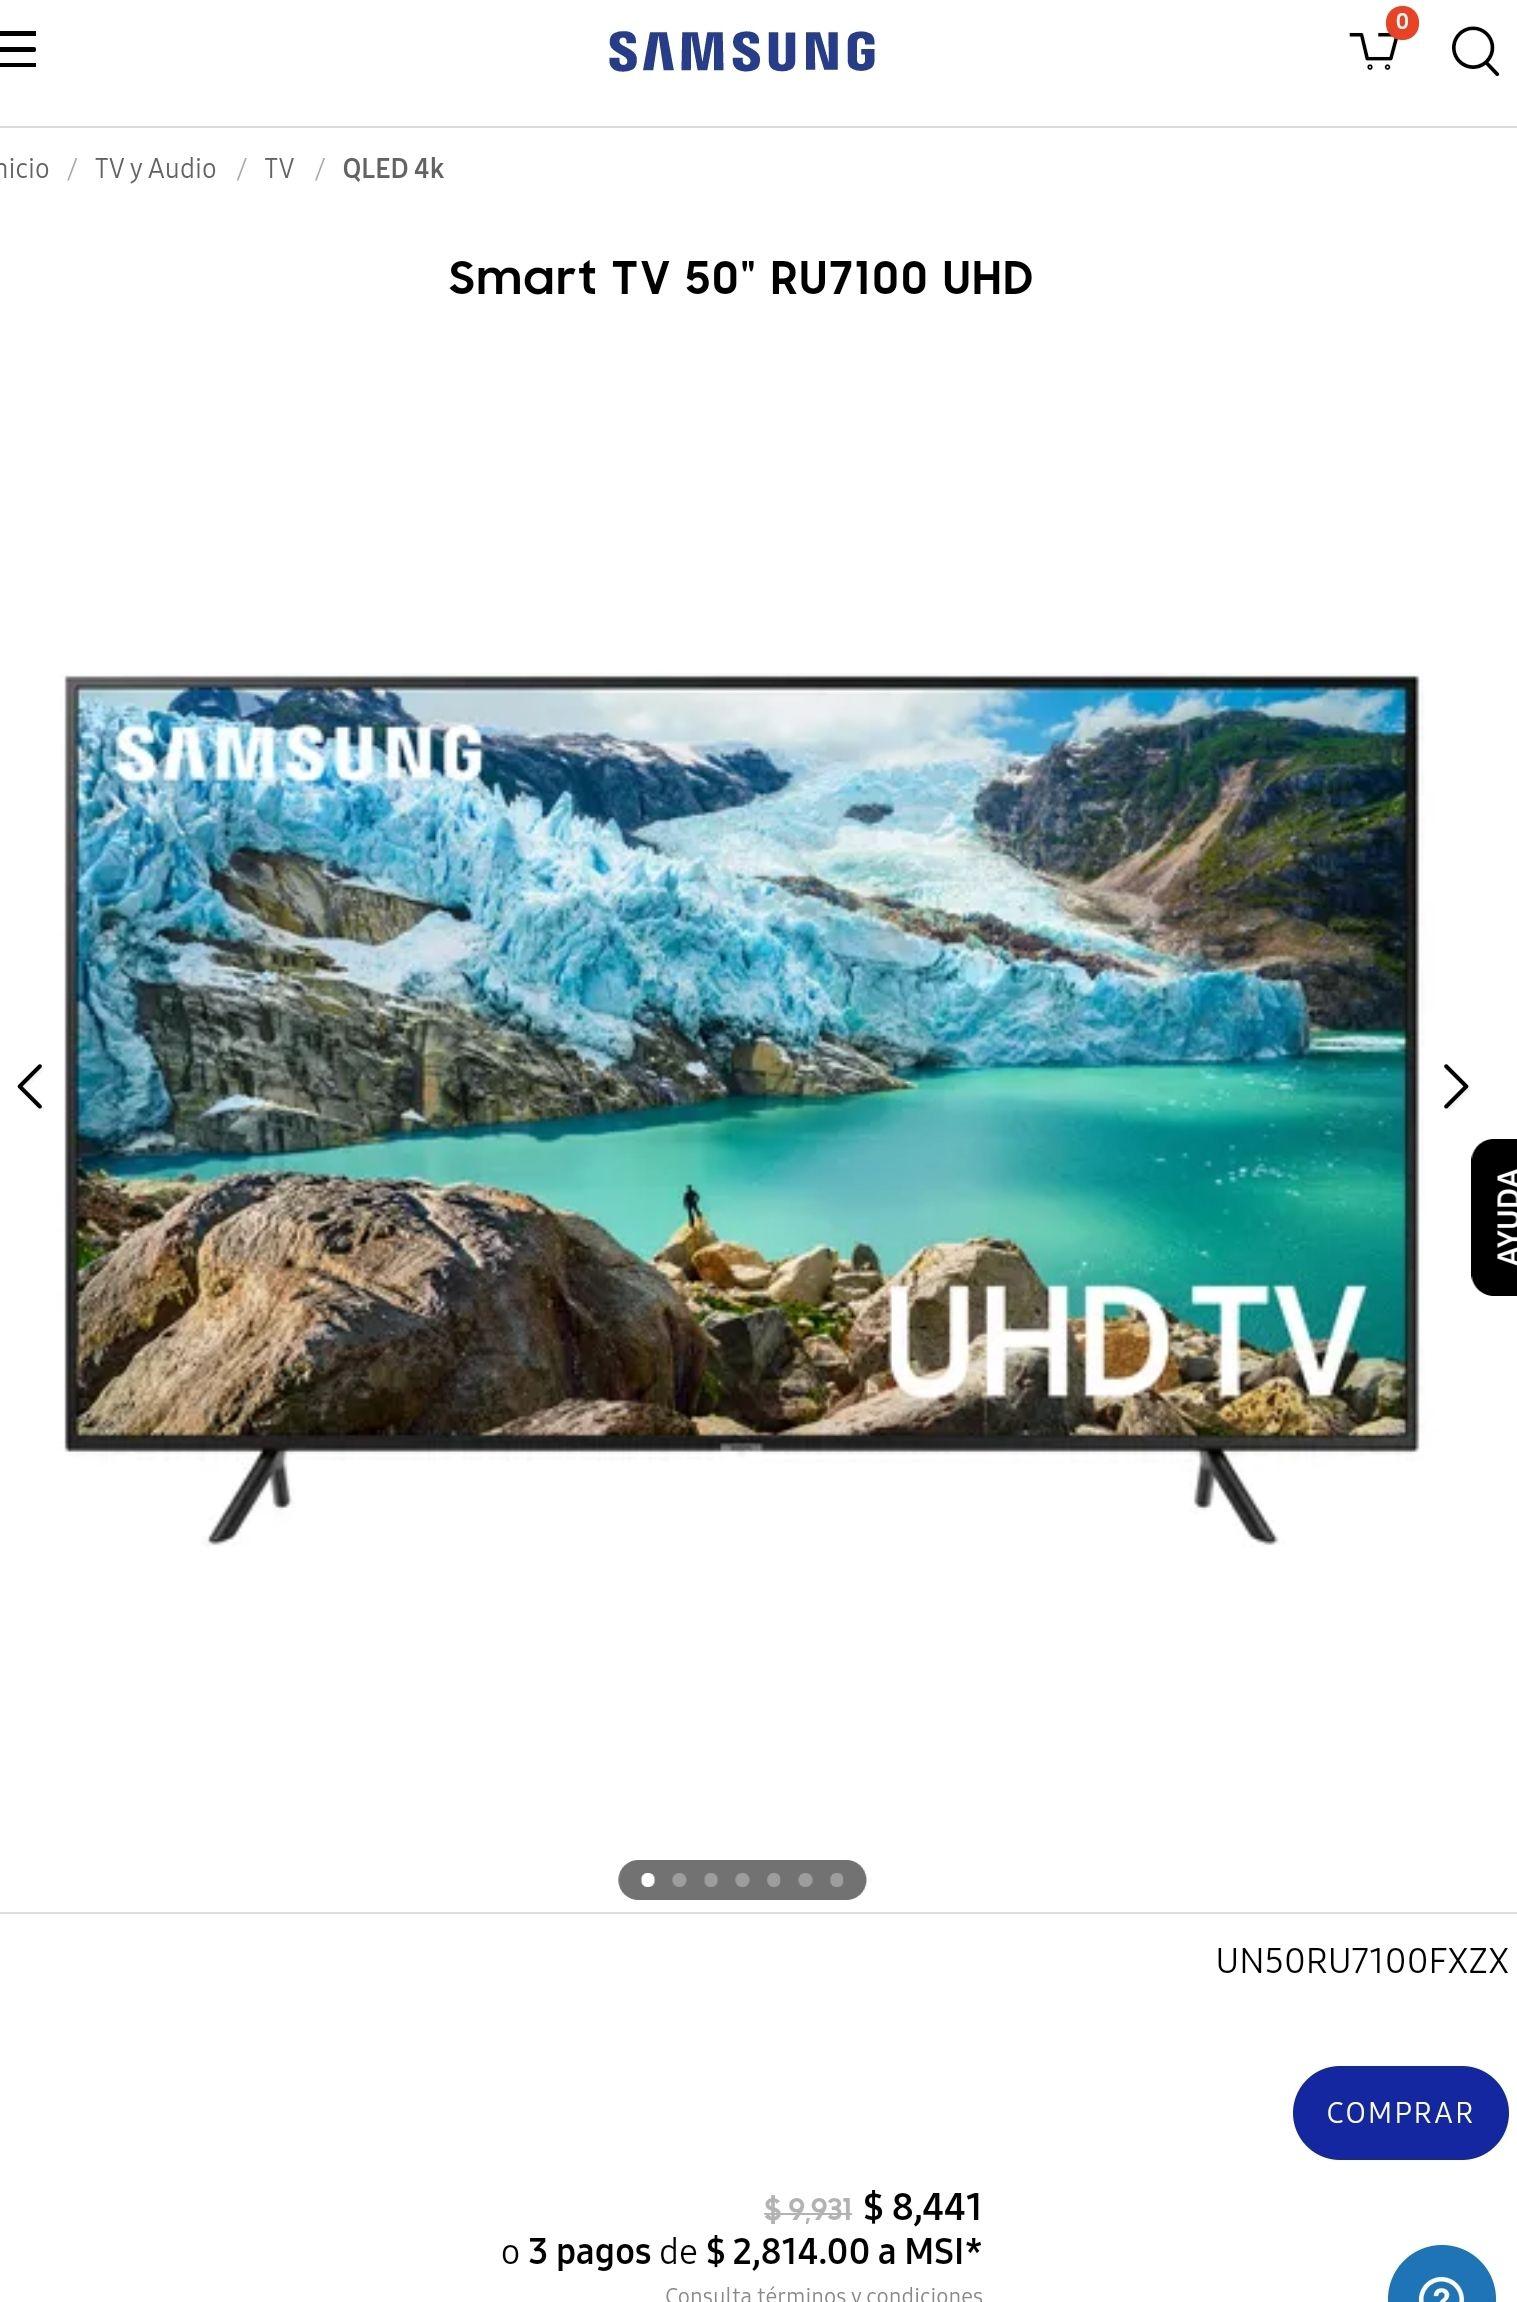 "Samsung Store: Smart TV 50"" RU7100 UHD"